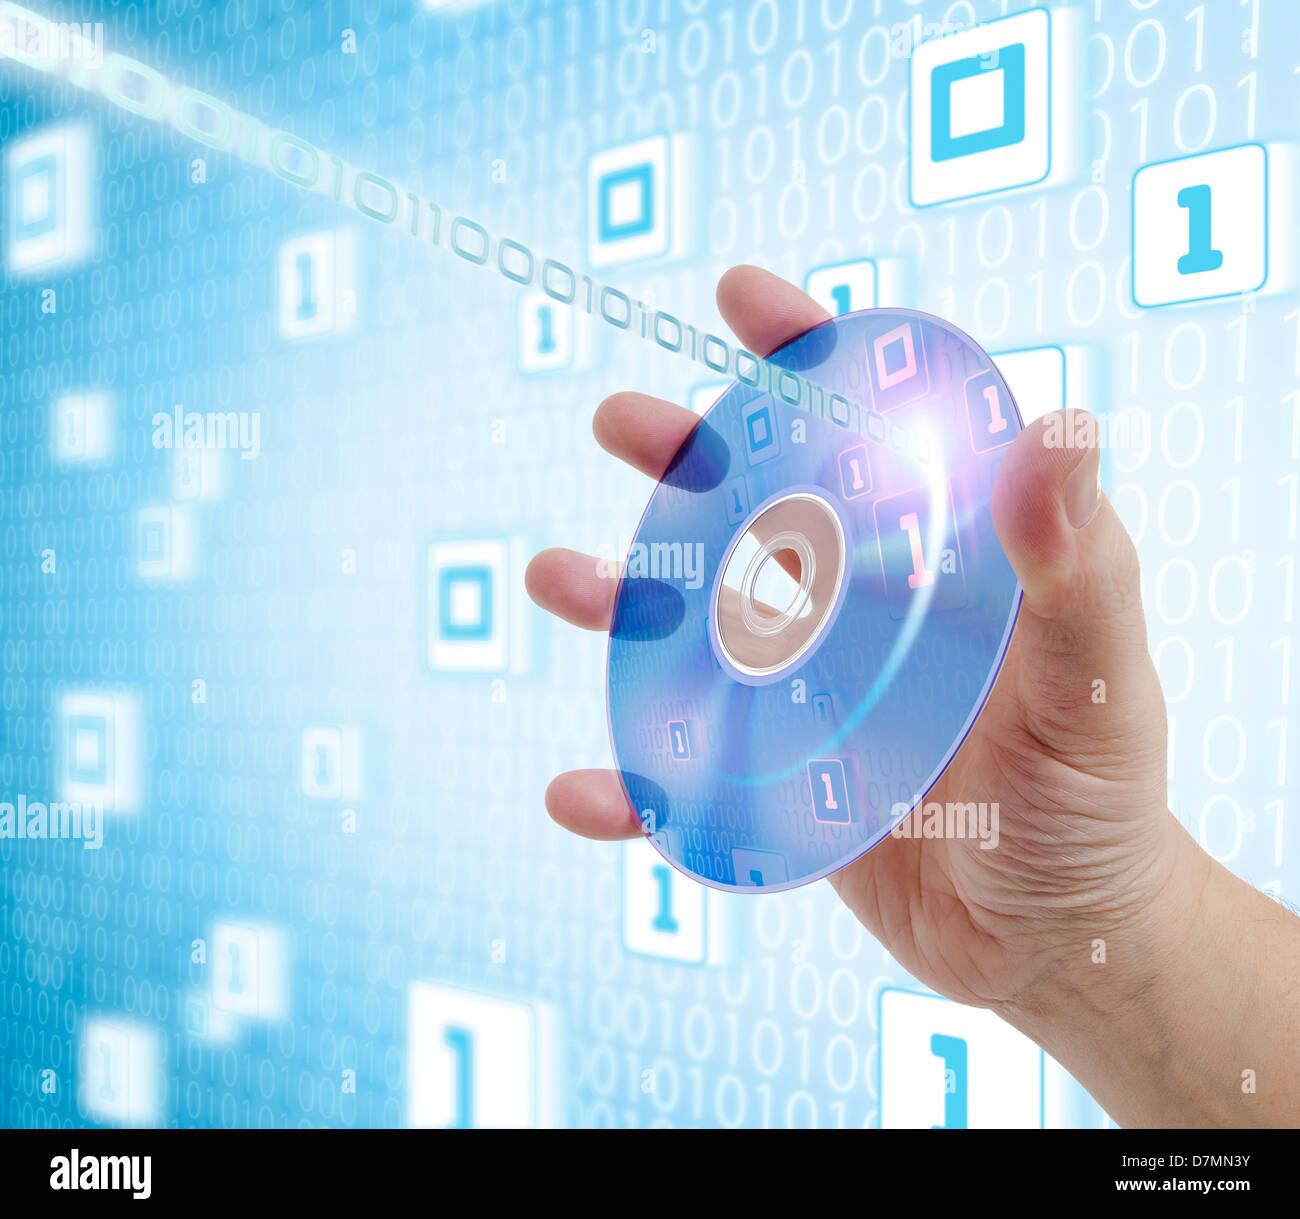 Digital storage, artwork - Stock Image